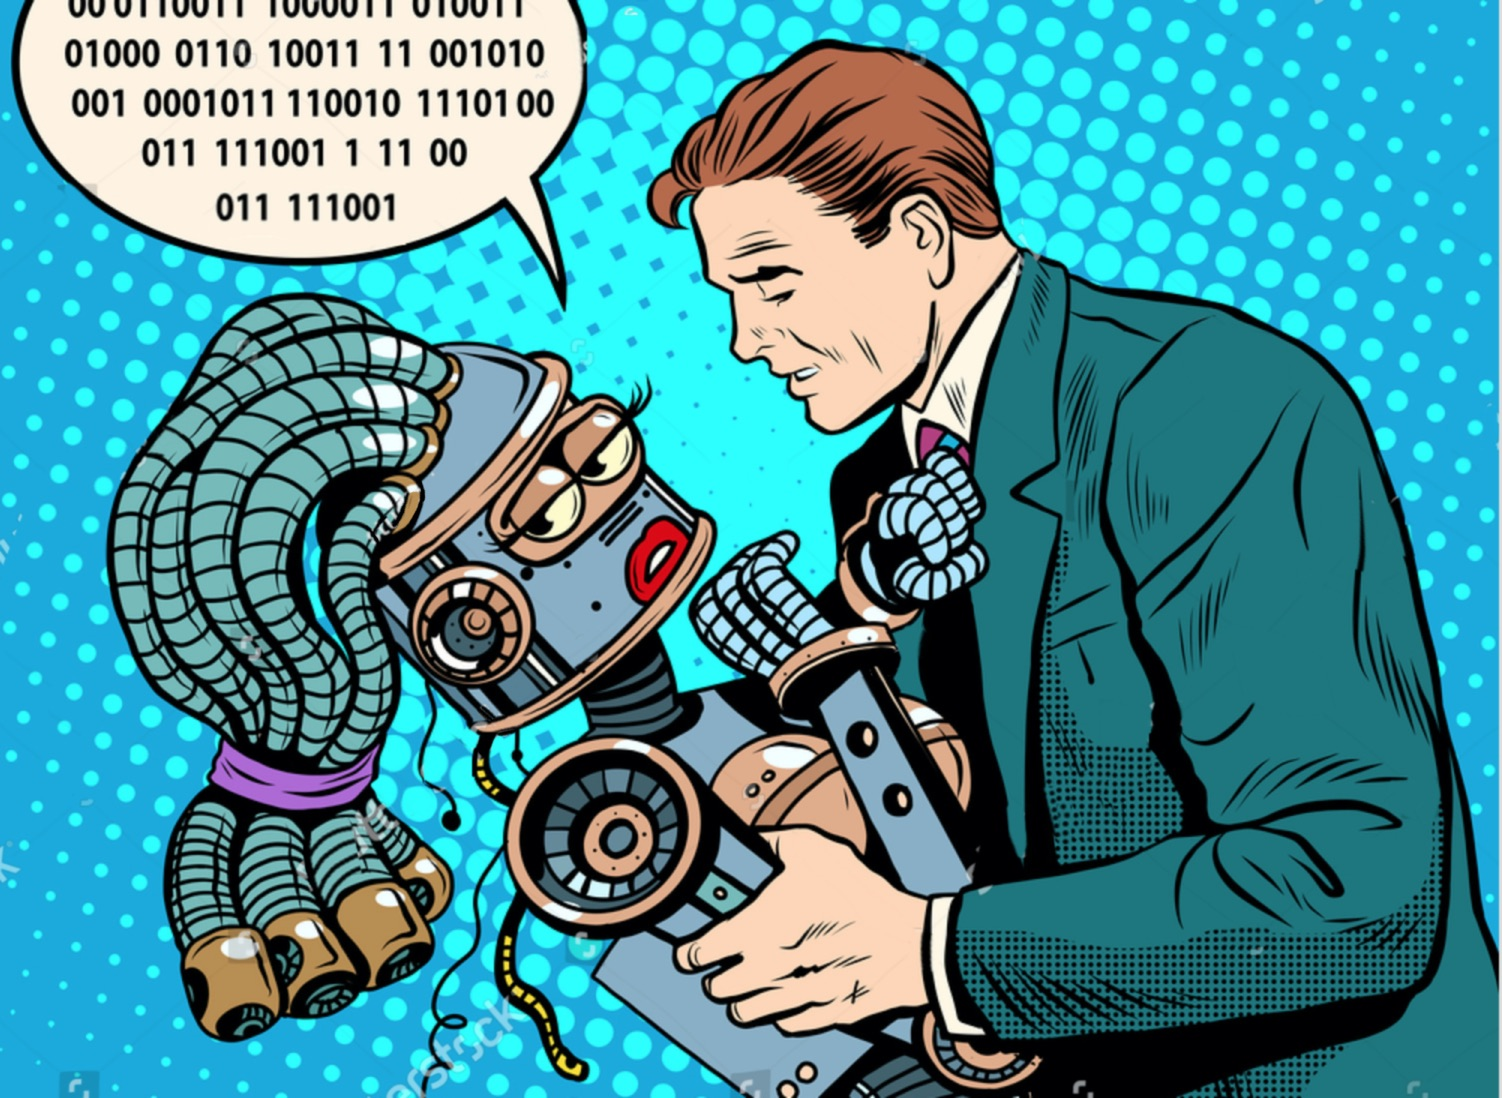 robot-yes-yes.jpg